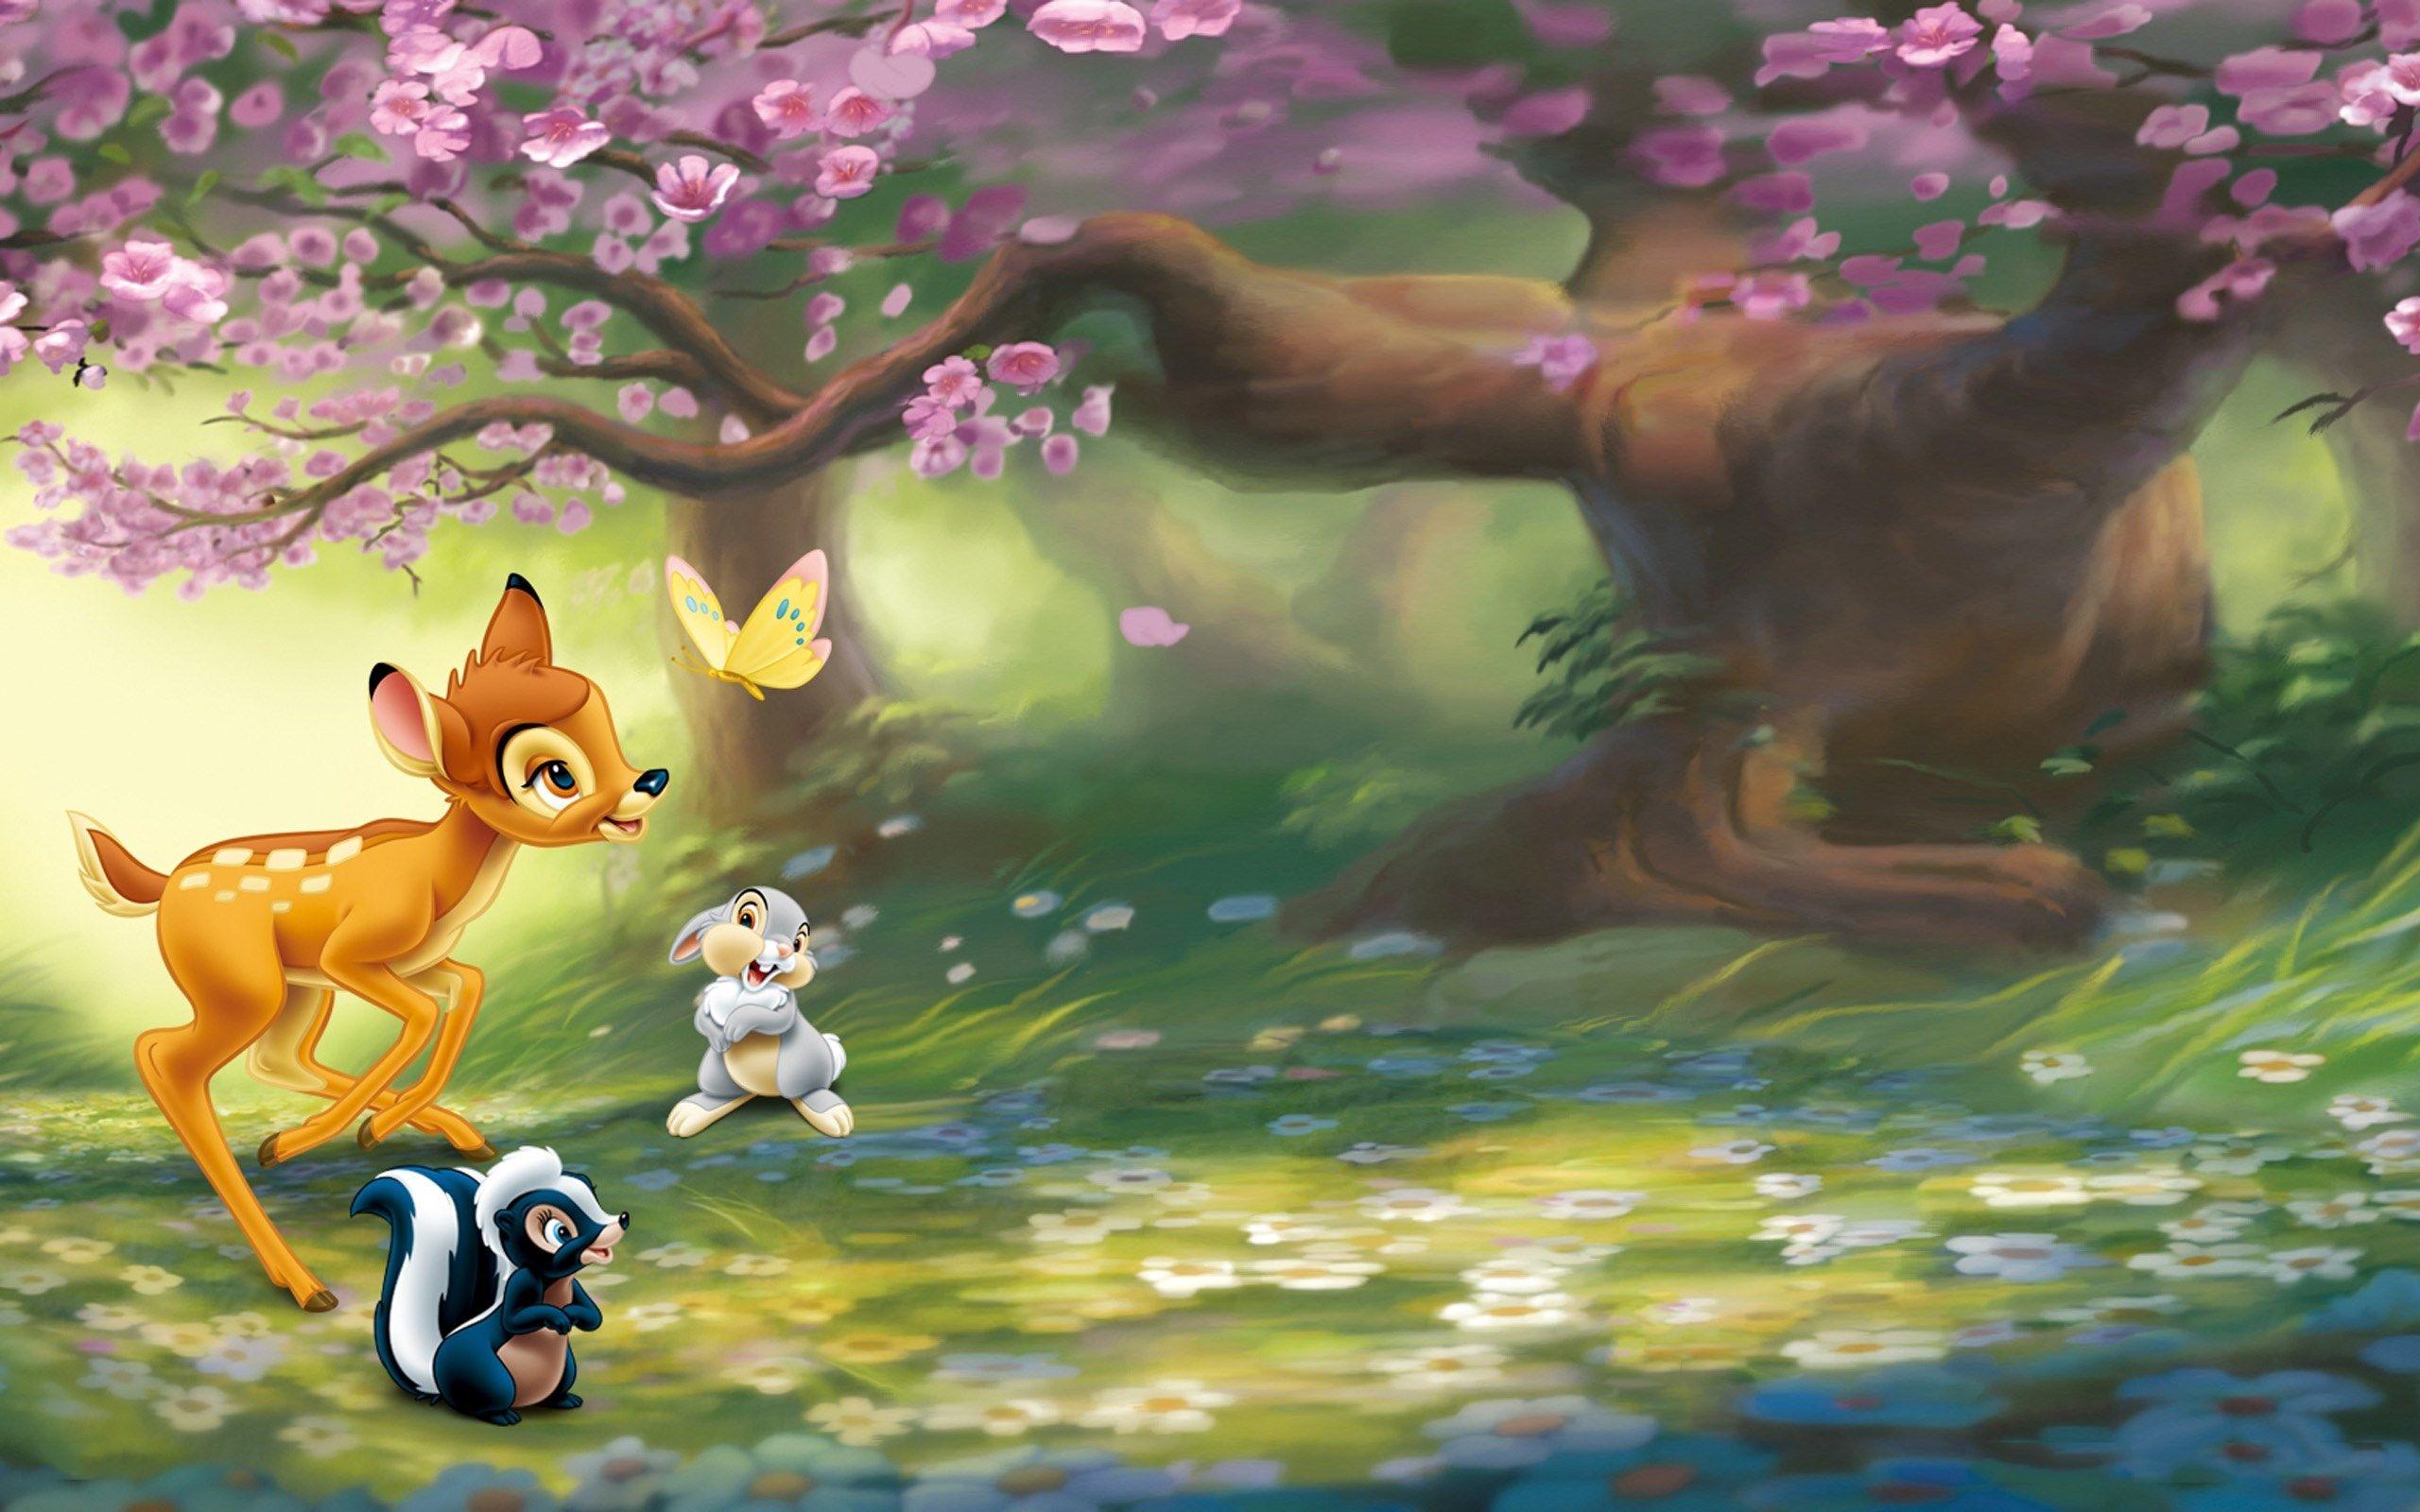 Disney Desktop Wallpaper Hd: Disney Cartoon Full HD Wallpaper